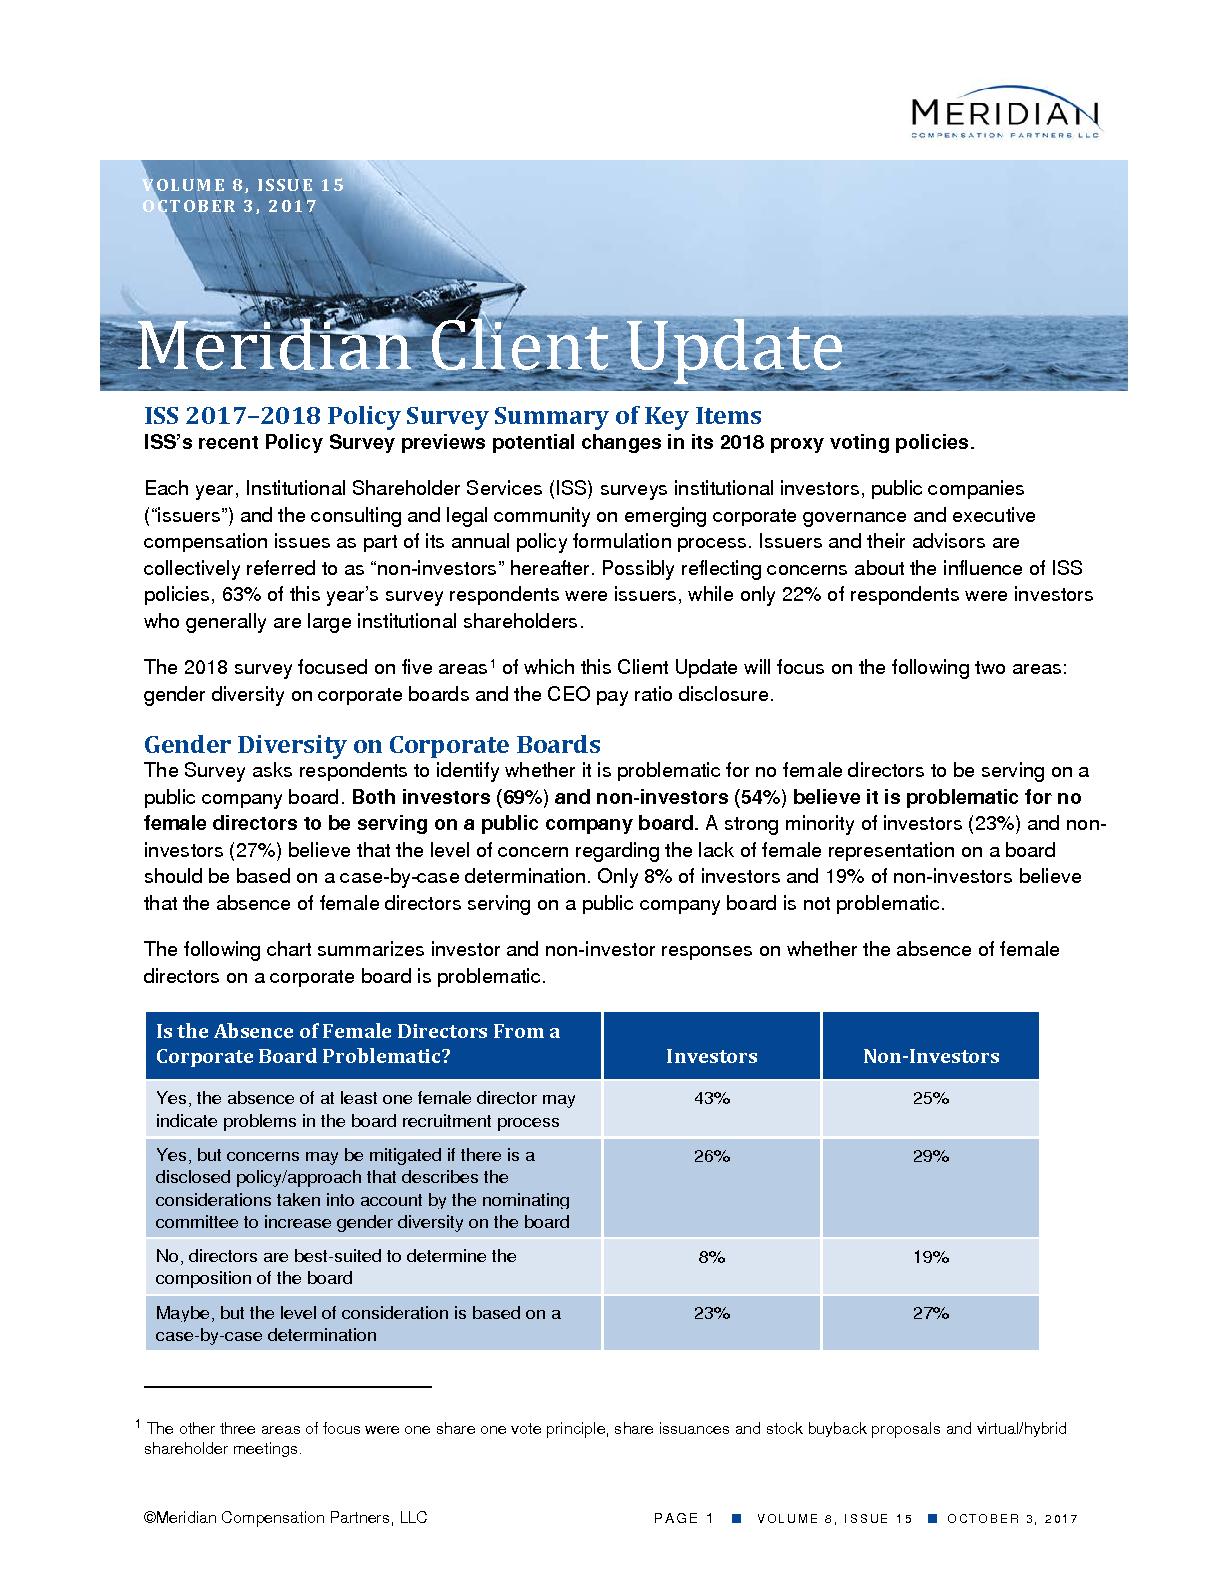 ISS 2017–2018 Policy Survey Summary of Key Items (PDF)